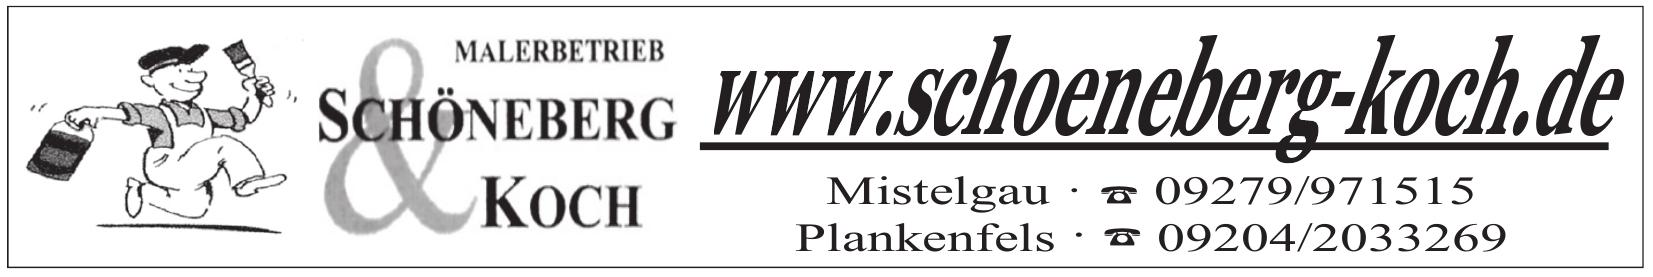 Malerbetrieb Schöneberg & Koch